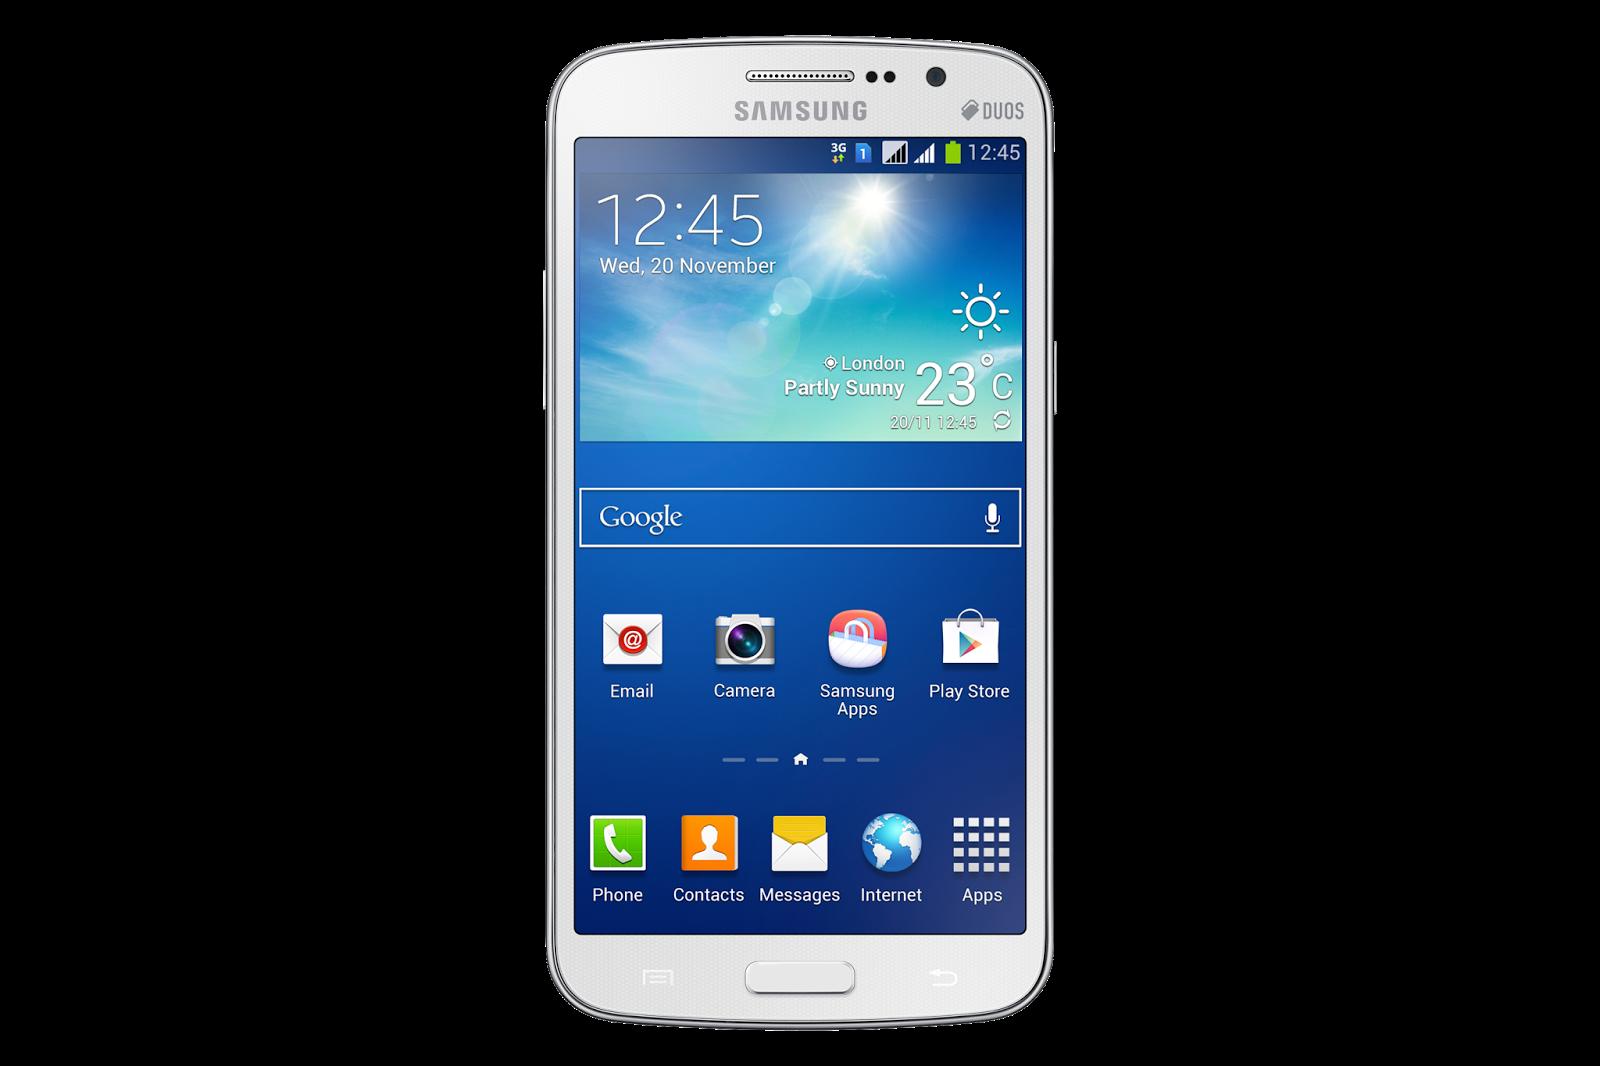 Samsung Duos: Galaxy Grand 2